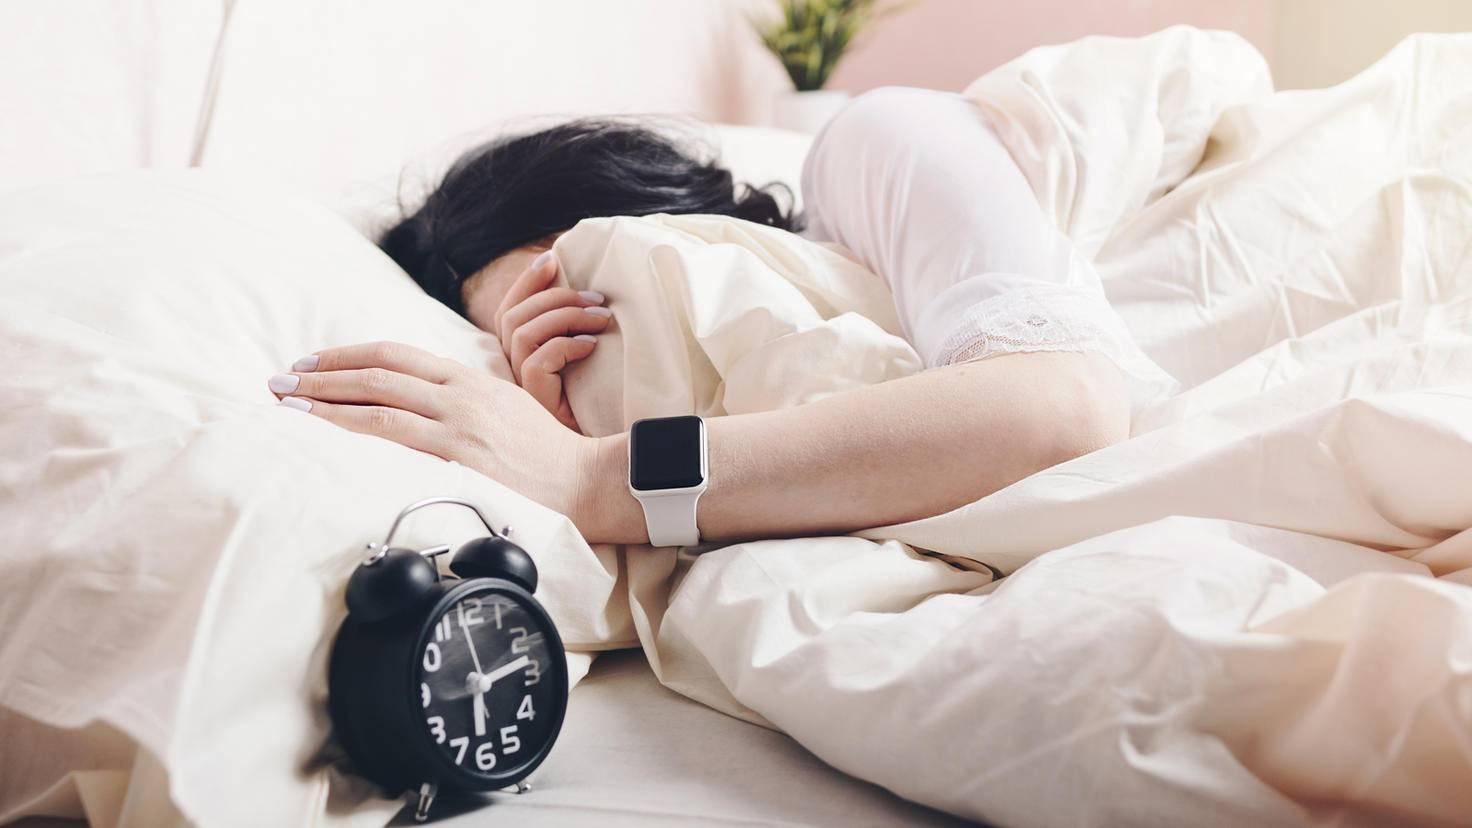 Apple Watch Sleep Apps Samio20-AdobeStock_247885903